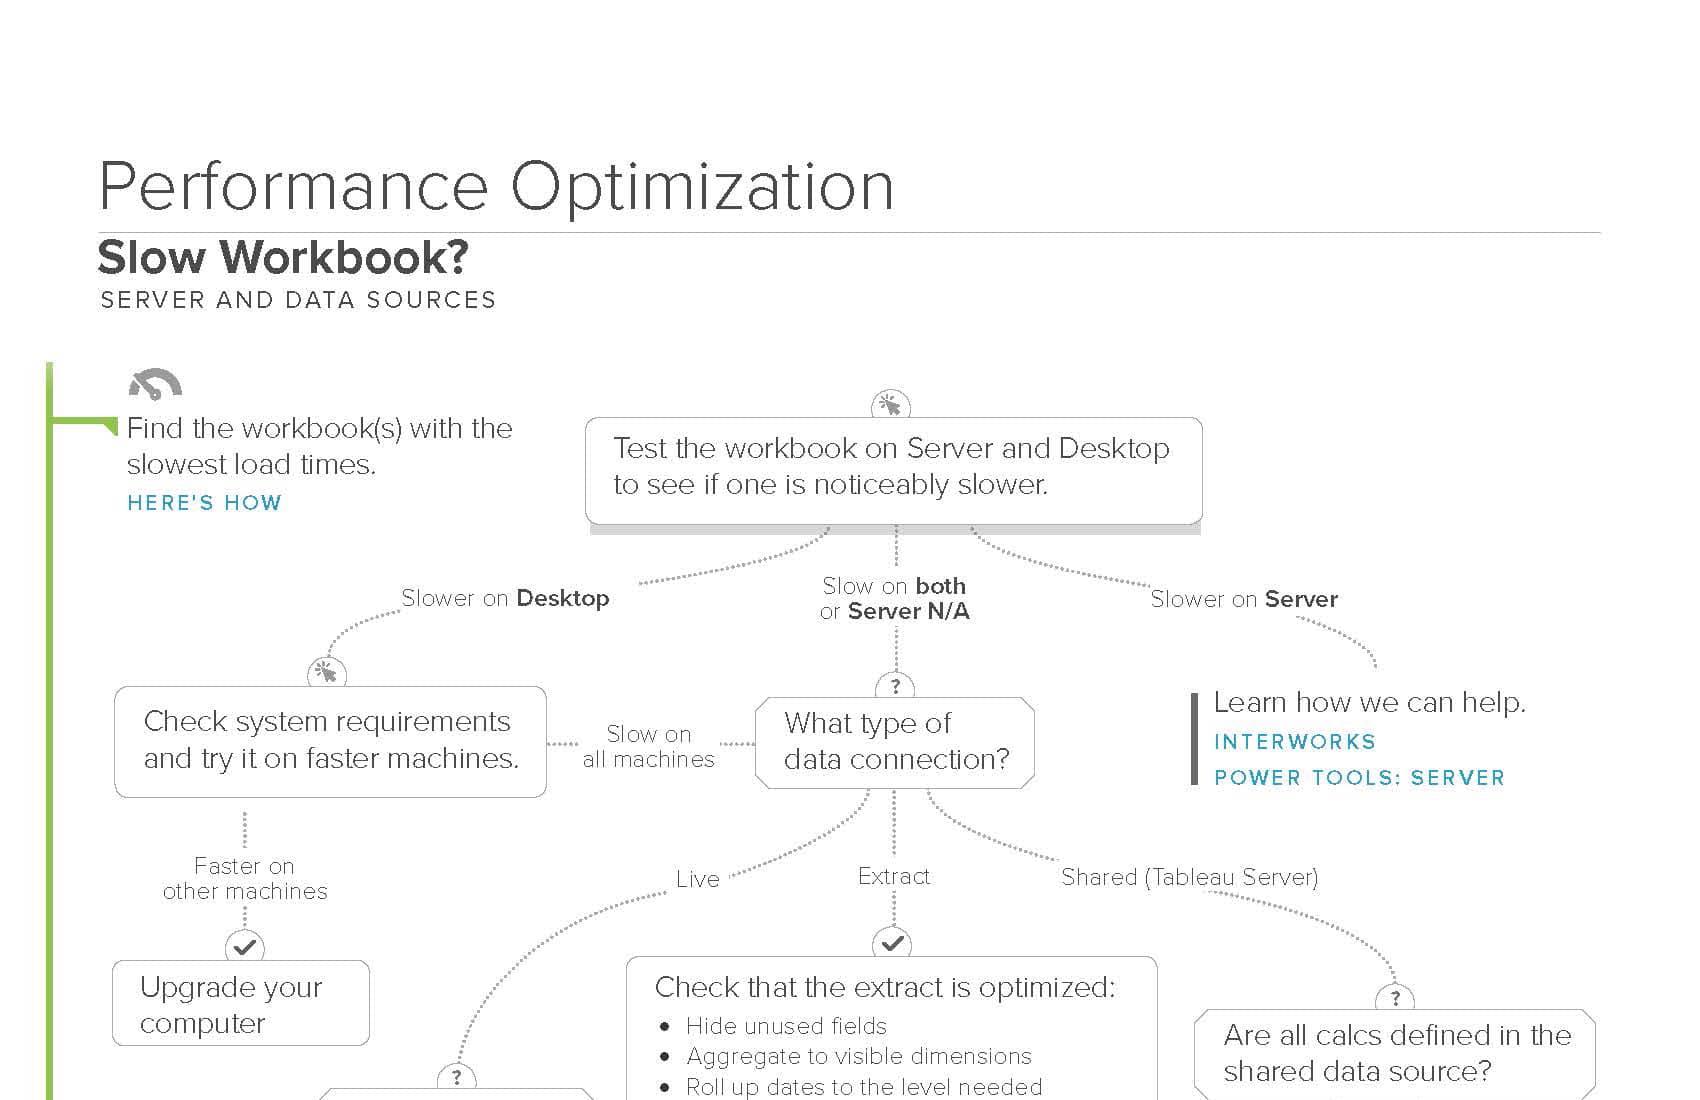 Home Interworks Source Diagram Brisbaneperformancecomau Blog The Tableau Performance Optimization Flowchart